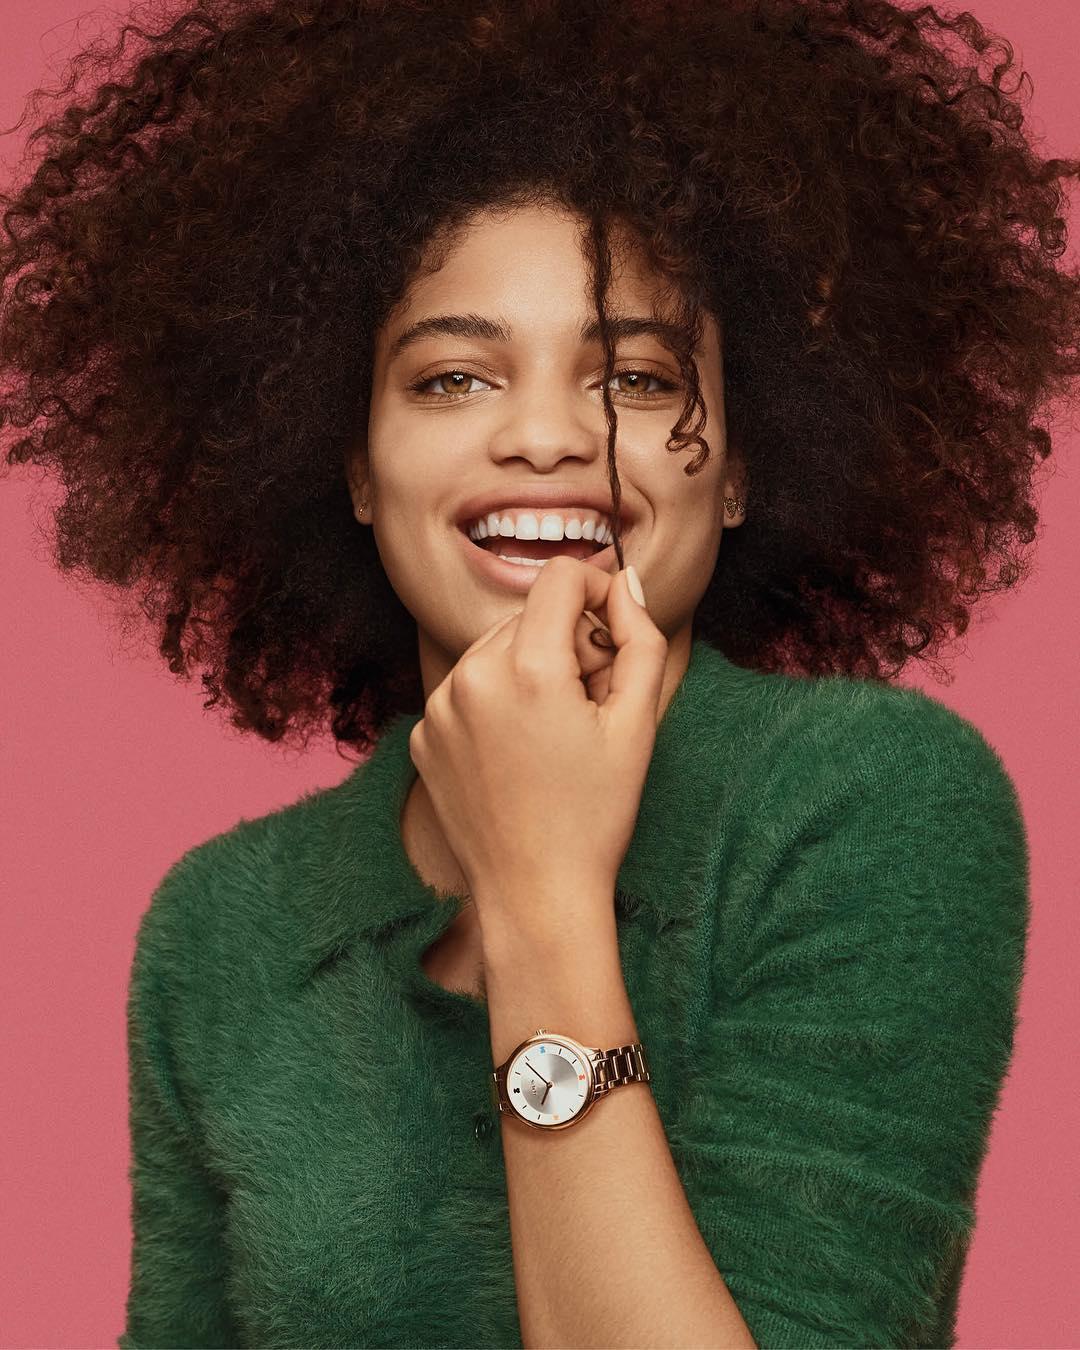 watch design Tous watch worn on a lady wrist